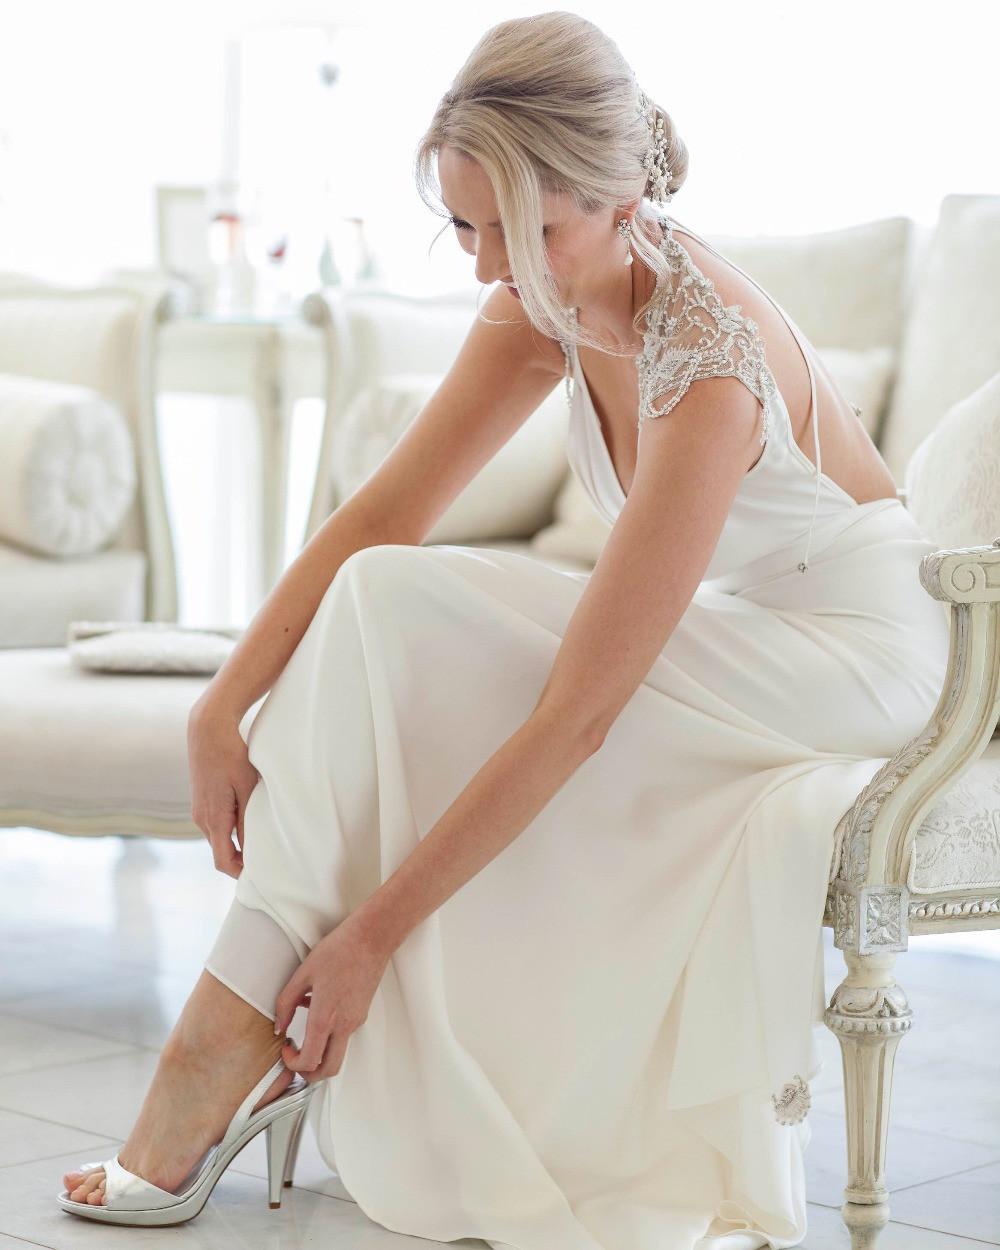 Bridal tan by Honey Glow Mobile Spray Tanning